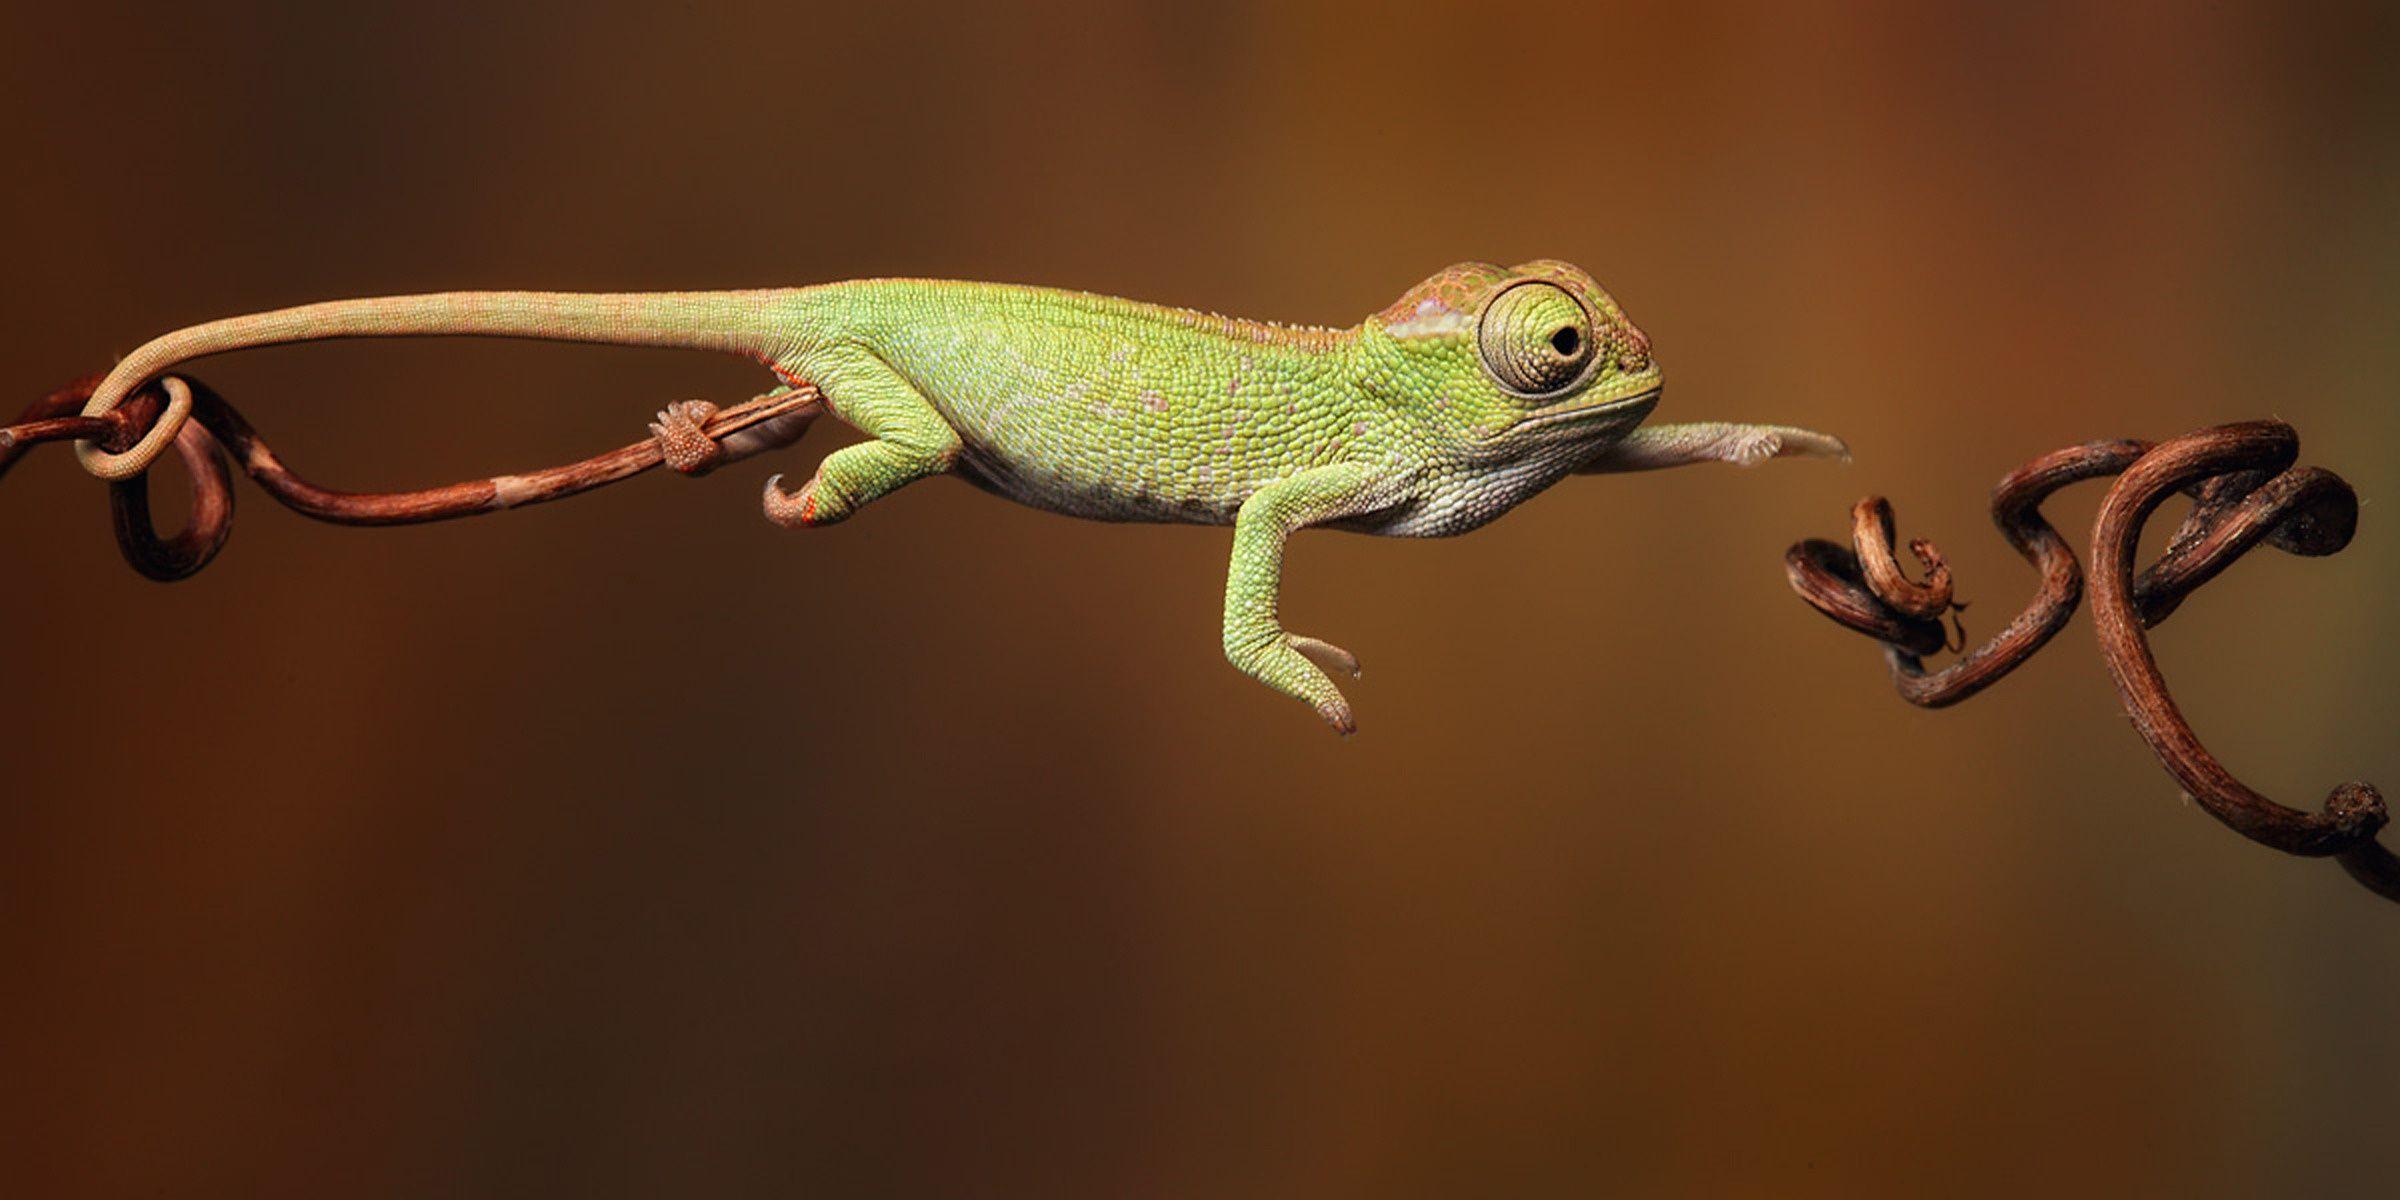 Wallpaper Chameleon Igor Siwanowicz Desktop Wallpaper Animals Reptiles And Amphibians Chameleon Baby Chameleon